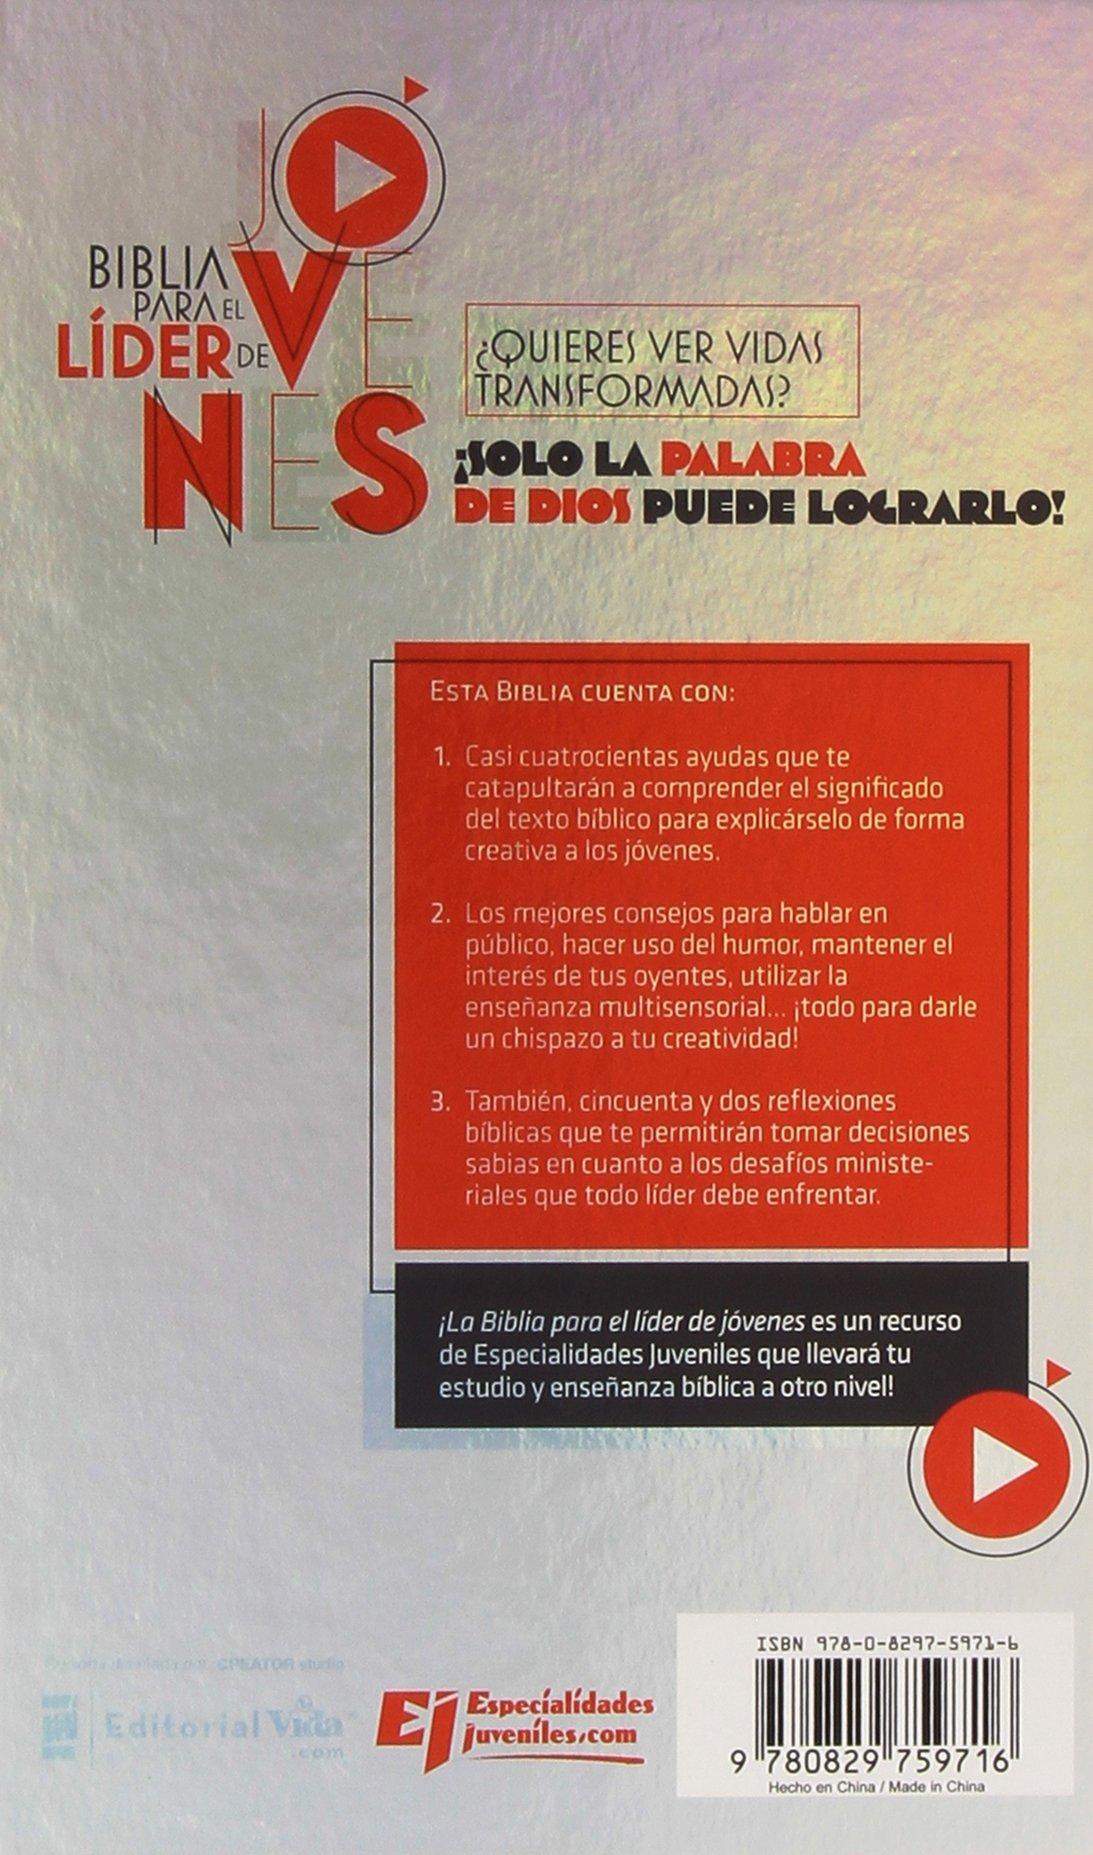 Biblia para el líder de jóvenes NVI (Especialidades Juveniles) (Spanish Edition): Howard Andruejol, Lucas Leys: 9780829759716: Amazon.com: Books